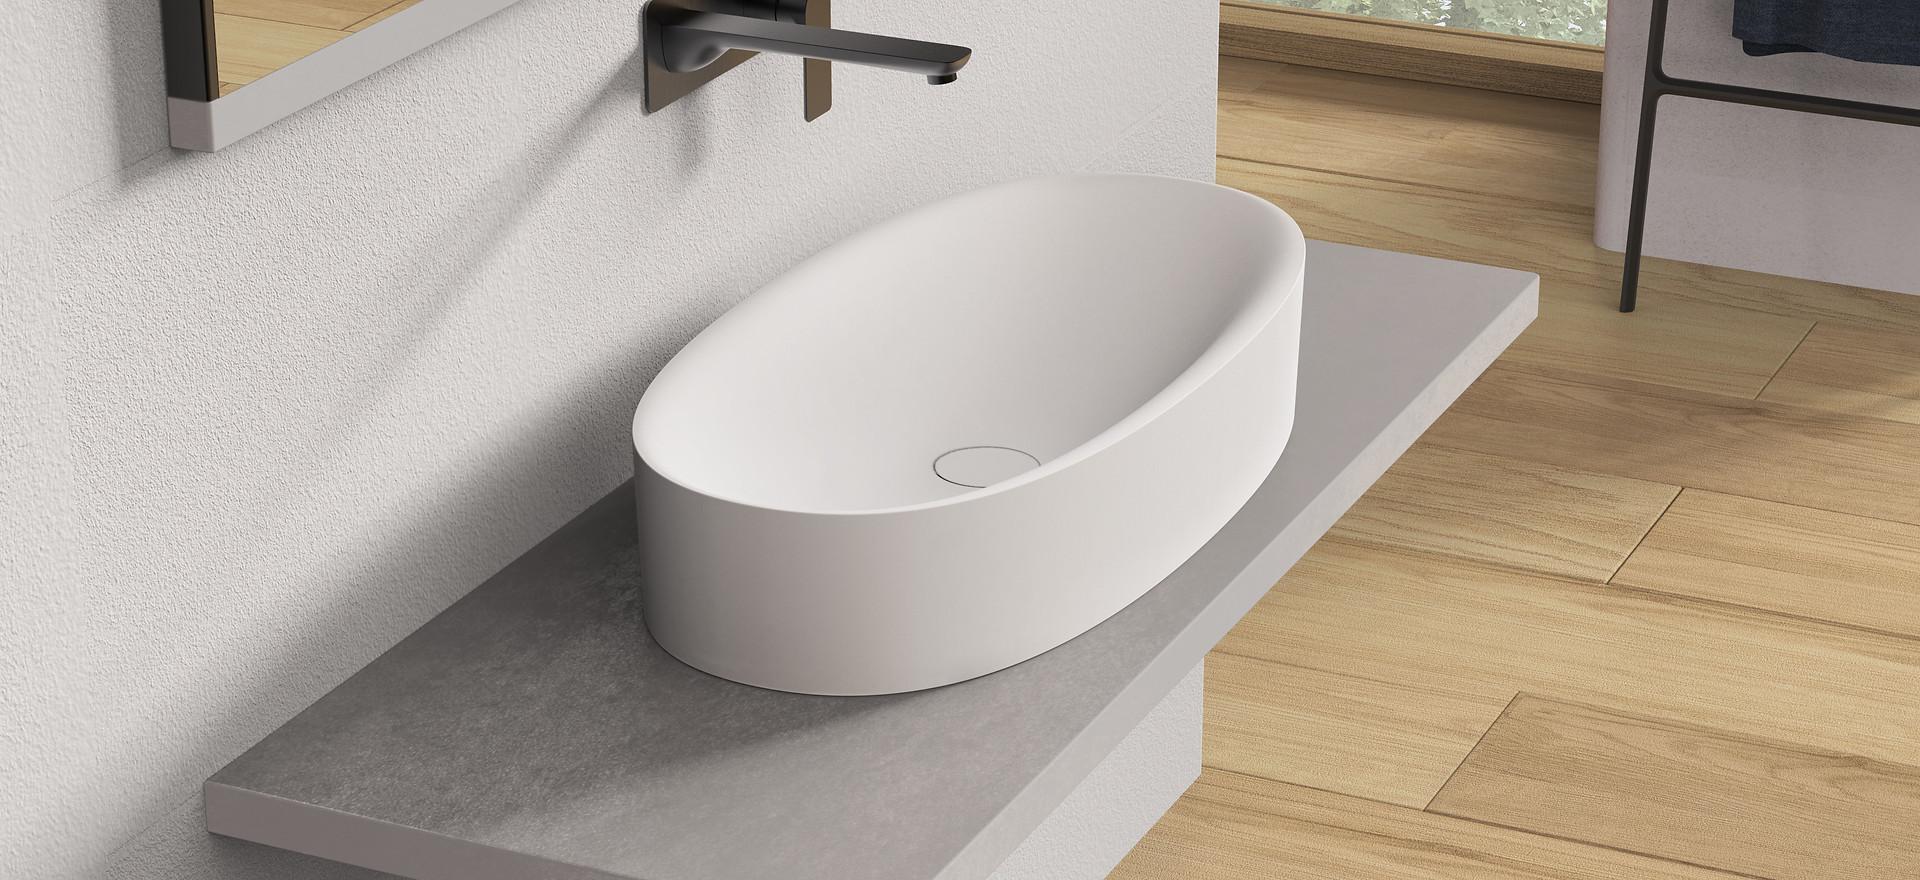 Solidcliff-70 Washbasin - Design Series for Ideavit B.V.